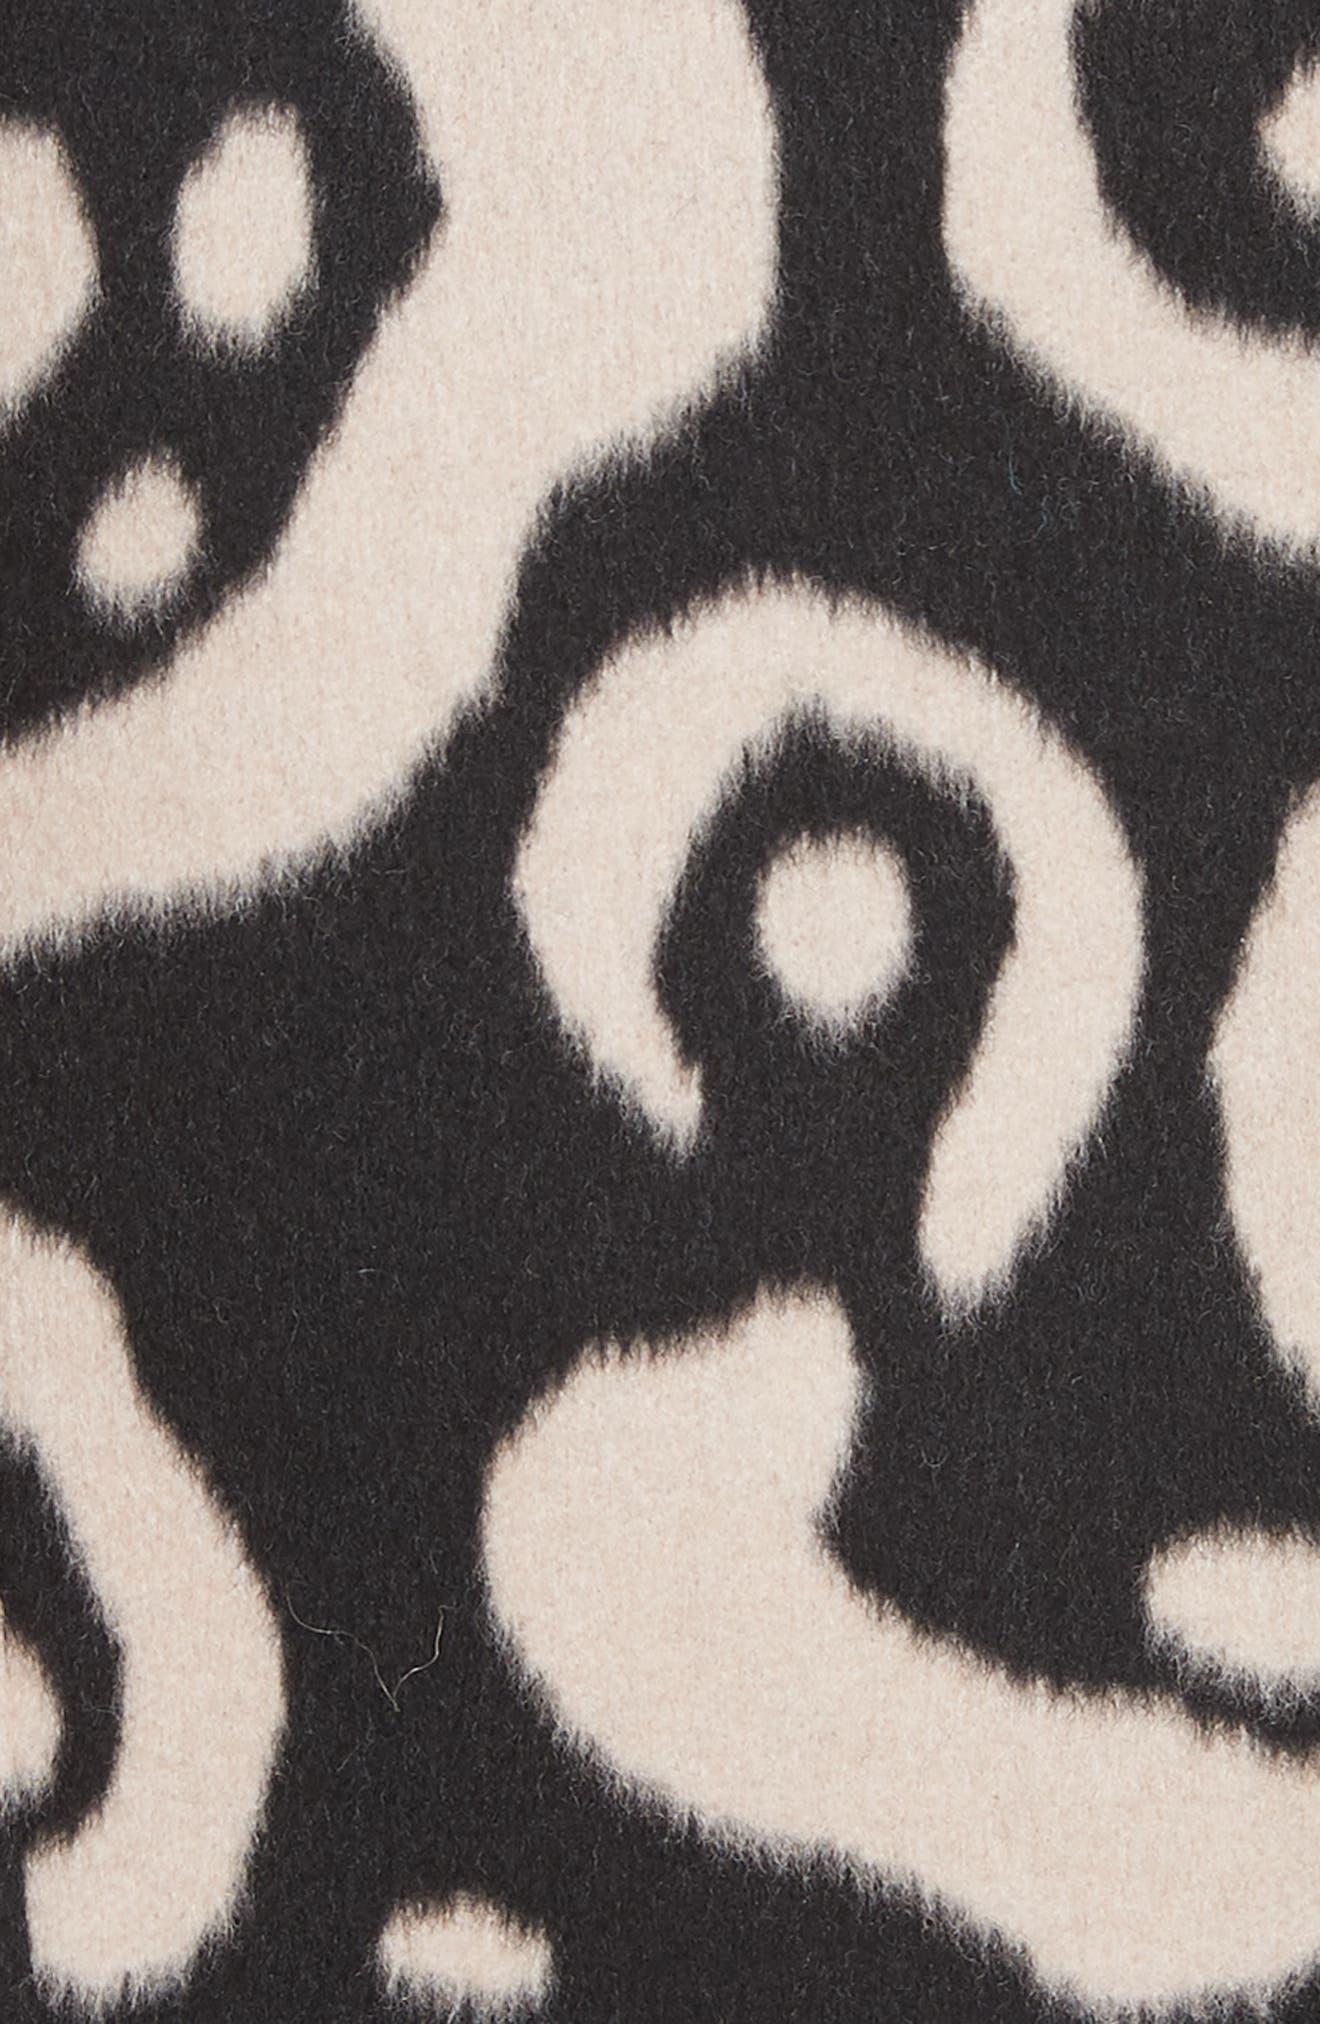 Driss Leopard Print Wool Blend Coat,                             Alternate thumbnail 5, color,                             001